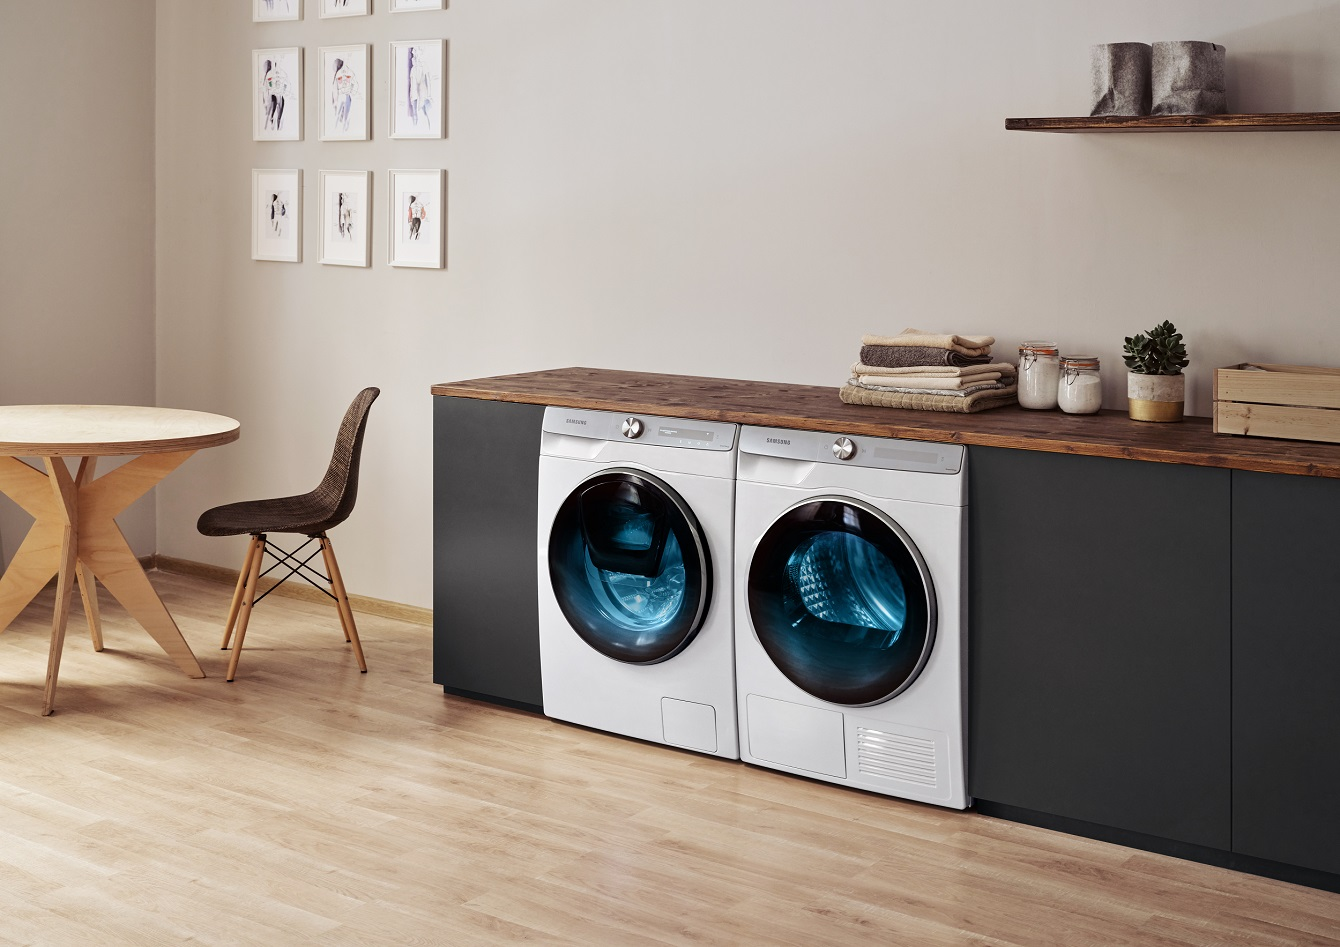 Samsung rozdaje smartfony za zakup pralki i suszarki